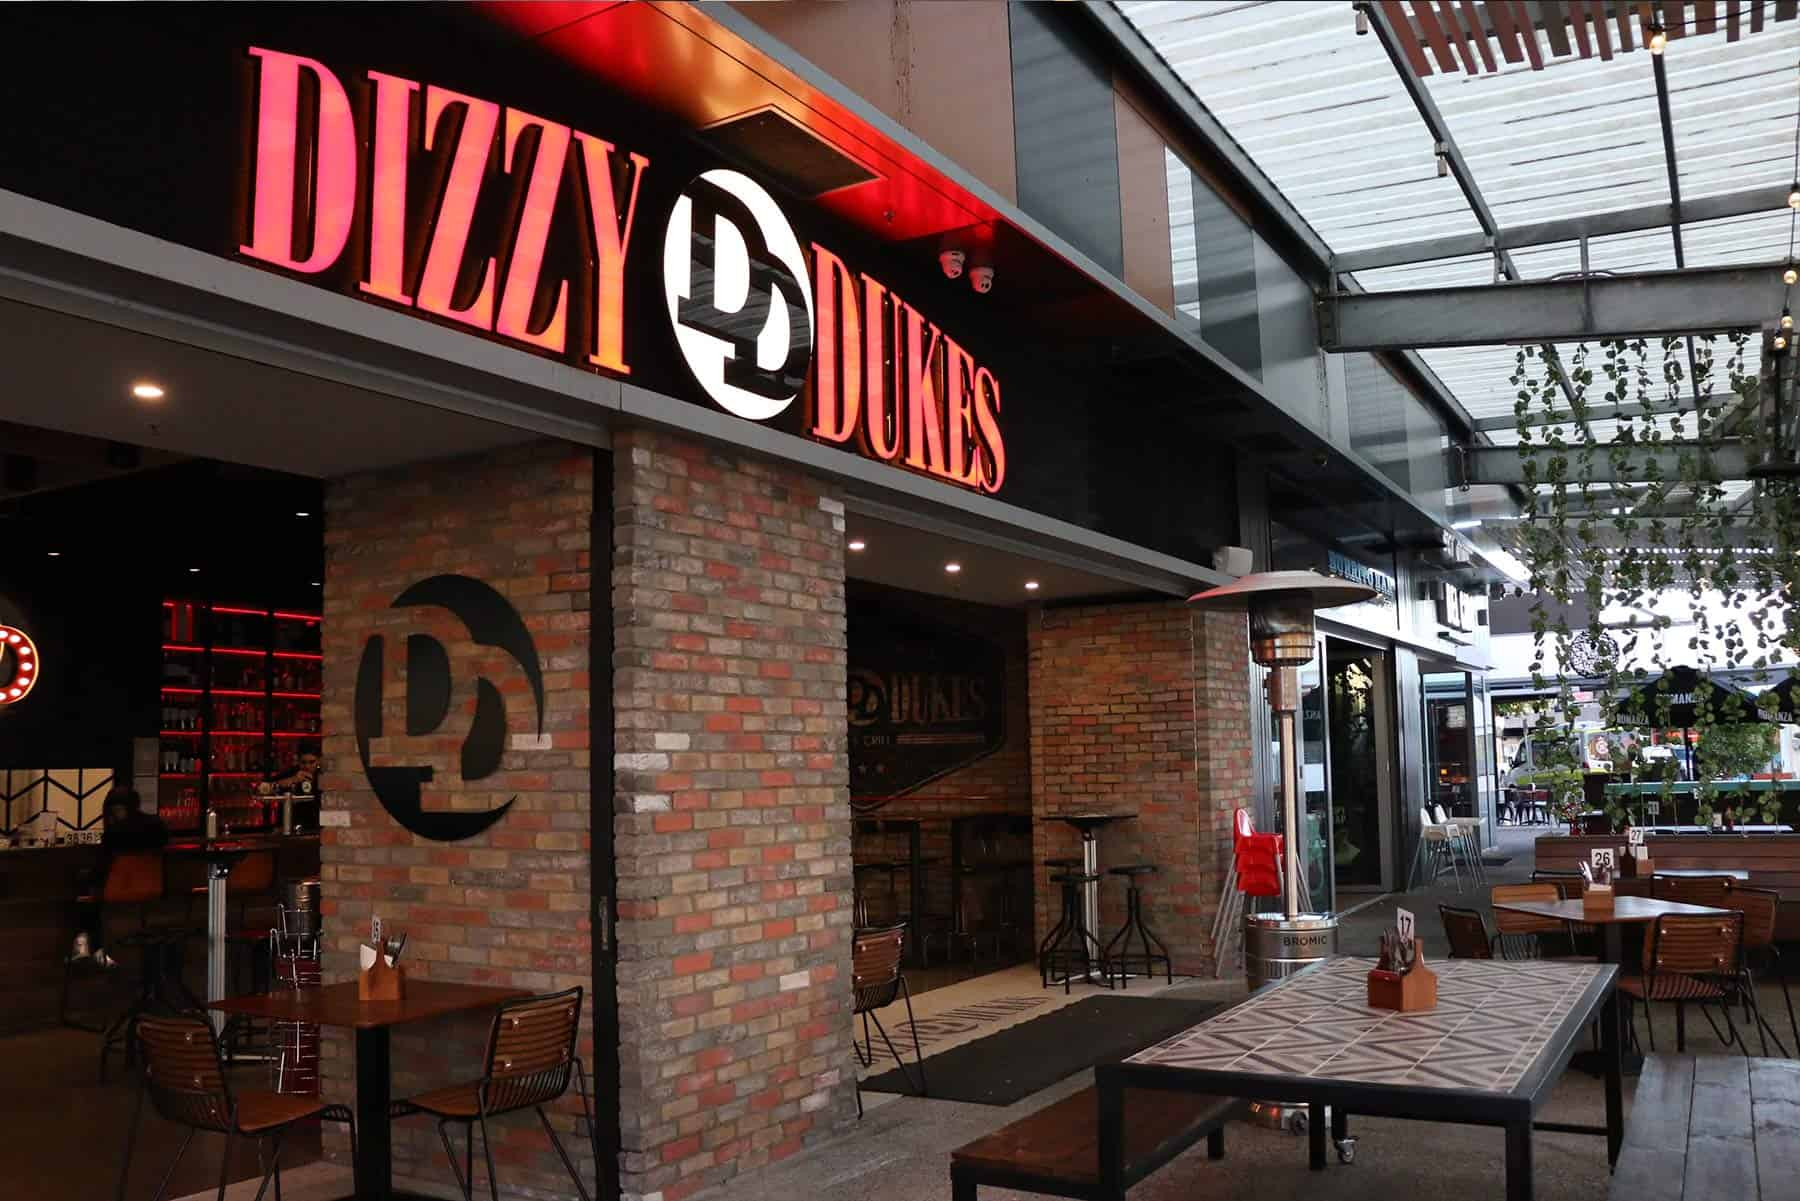 Dizzy Dukes